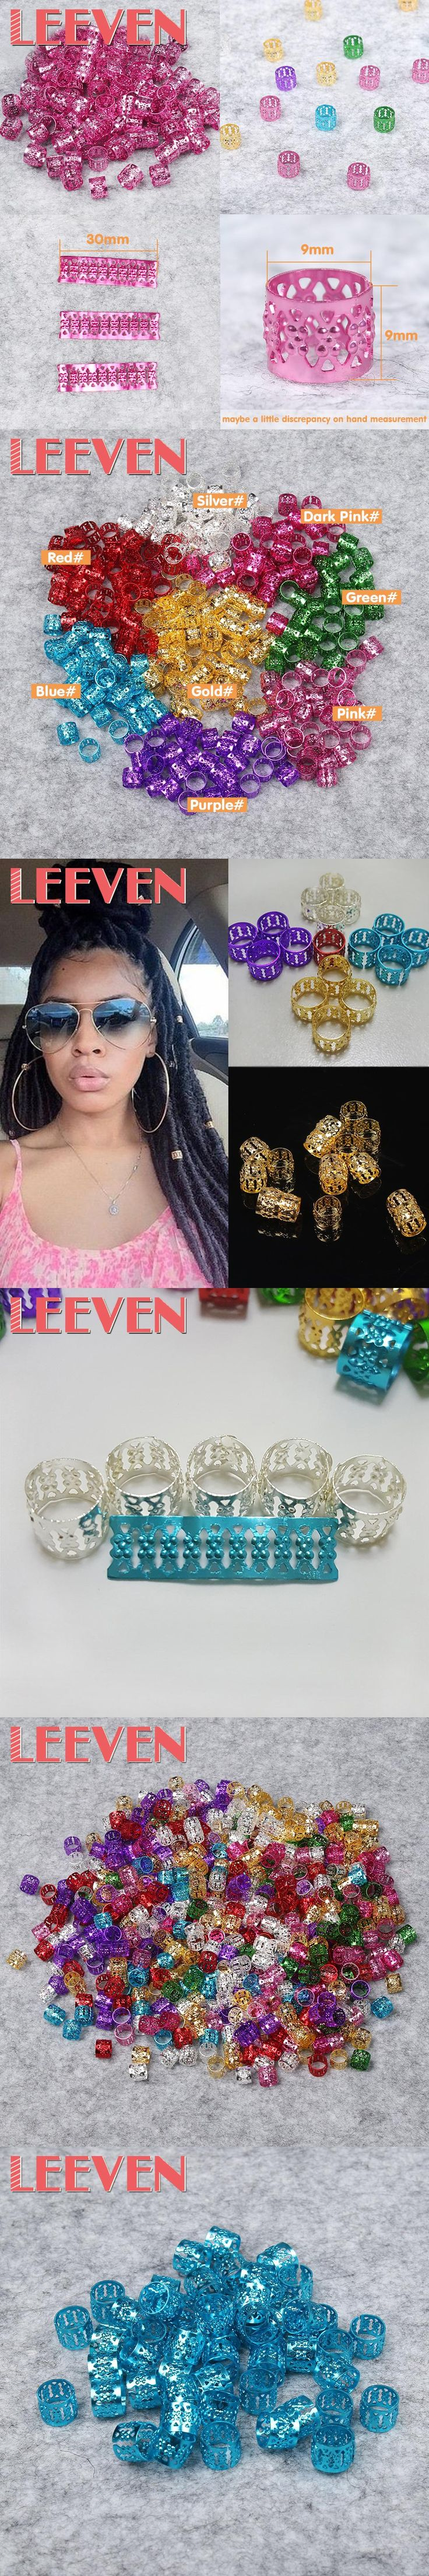 100pcs/lot Adjustable Hair Ring Dreadlock Beads for Dreadlocks  Senegalese Havana Twist Hair Golden Silver Blue Multi Colors